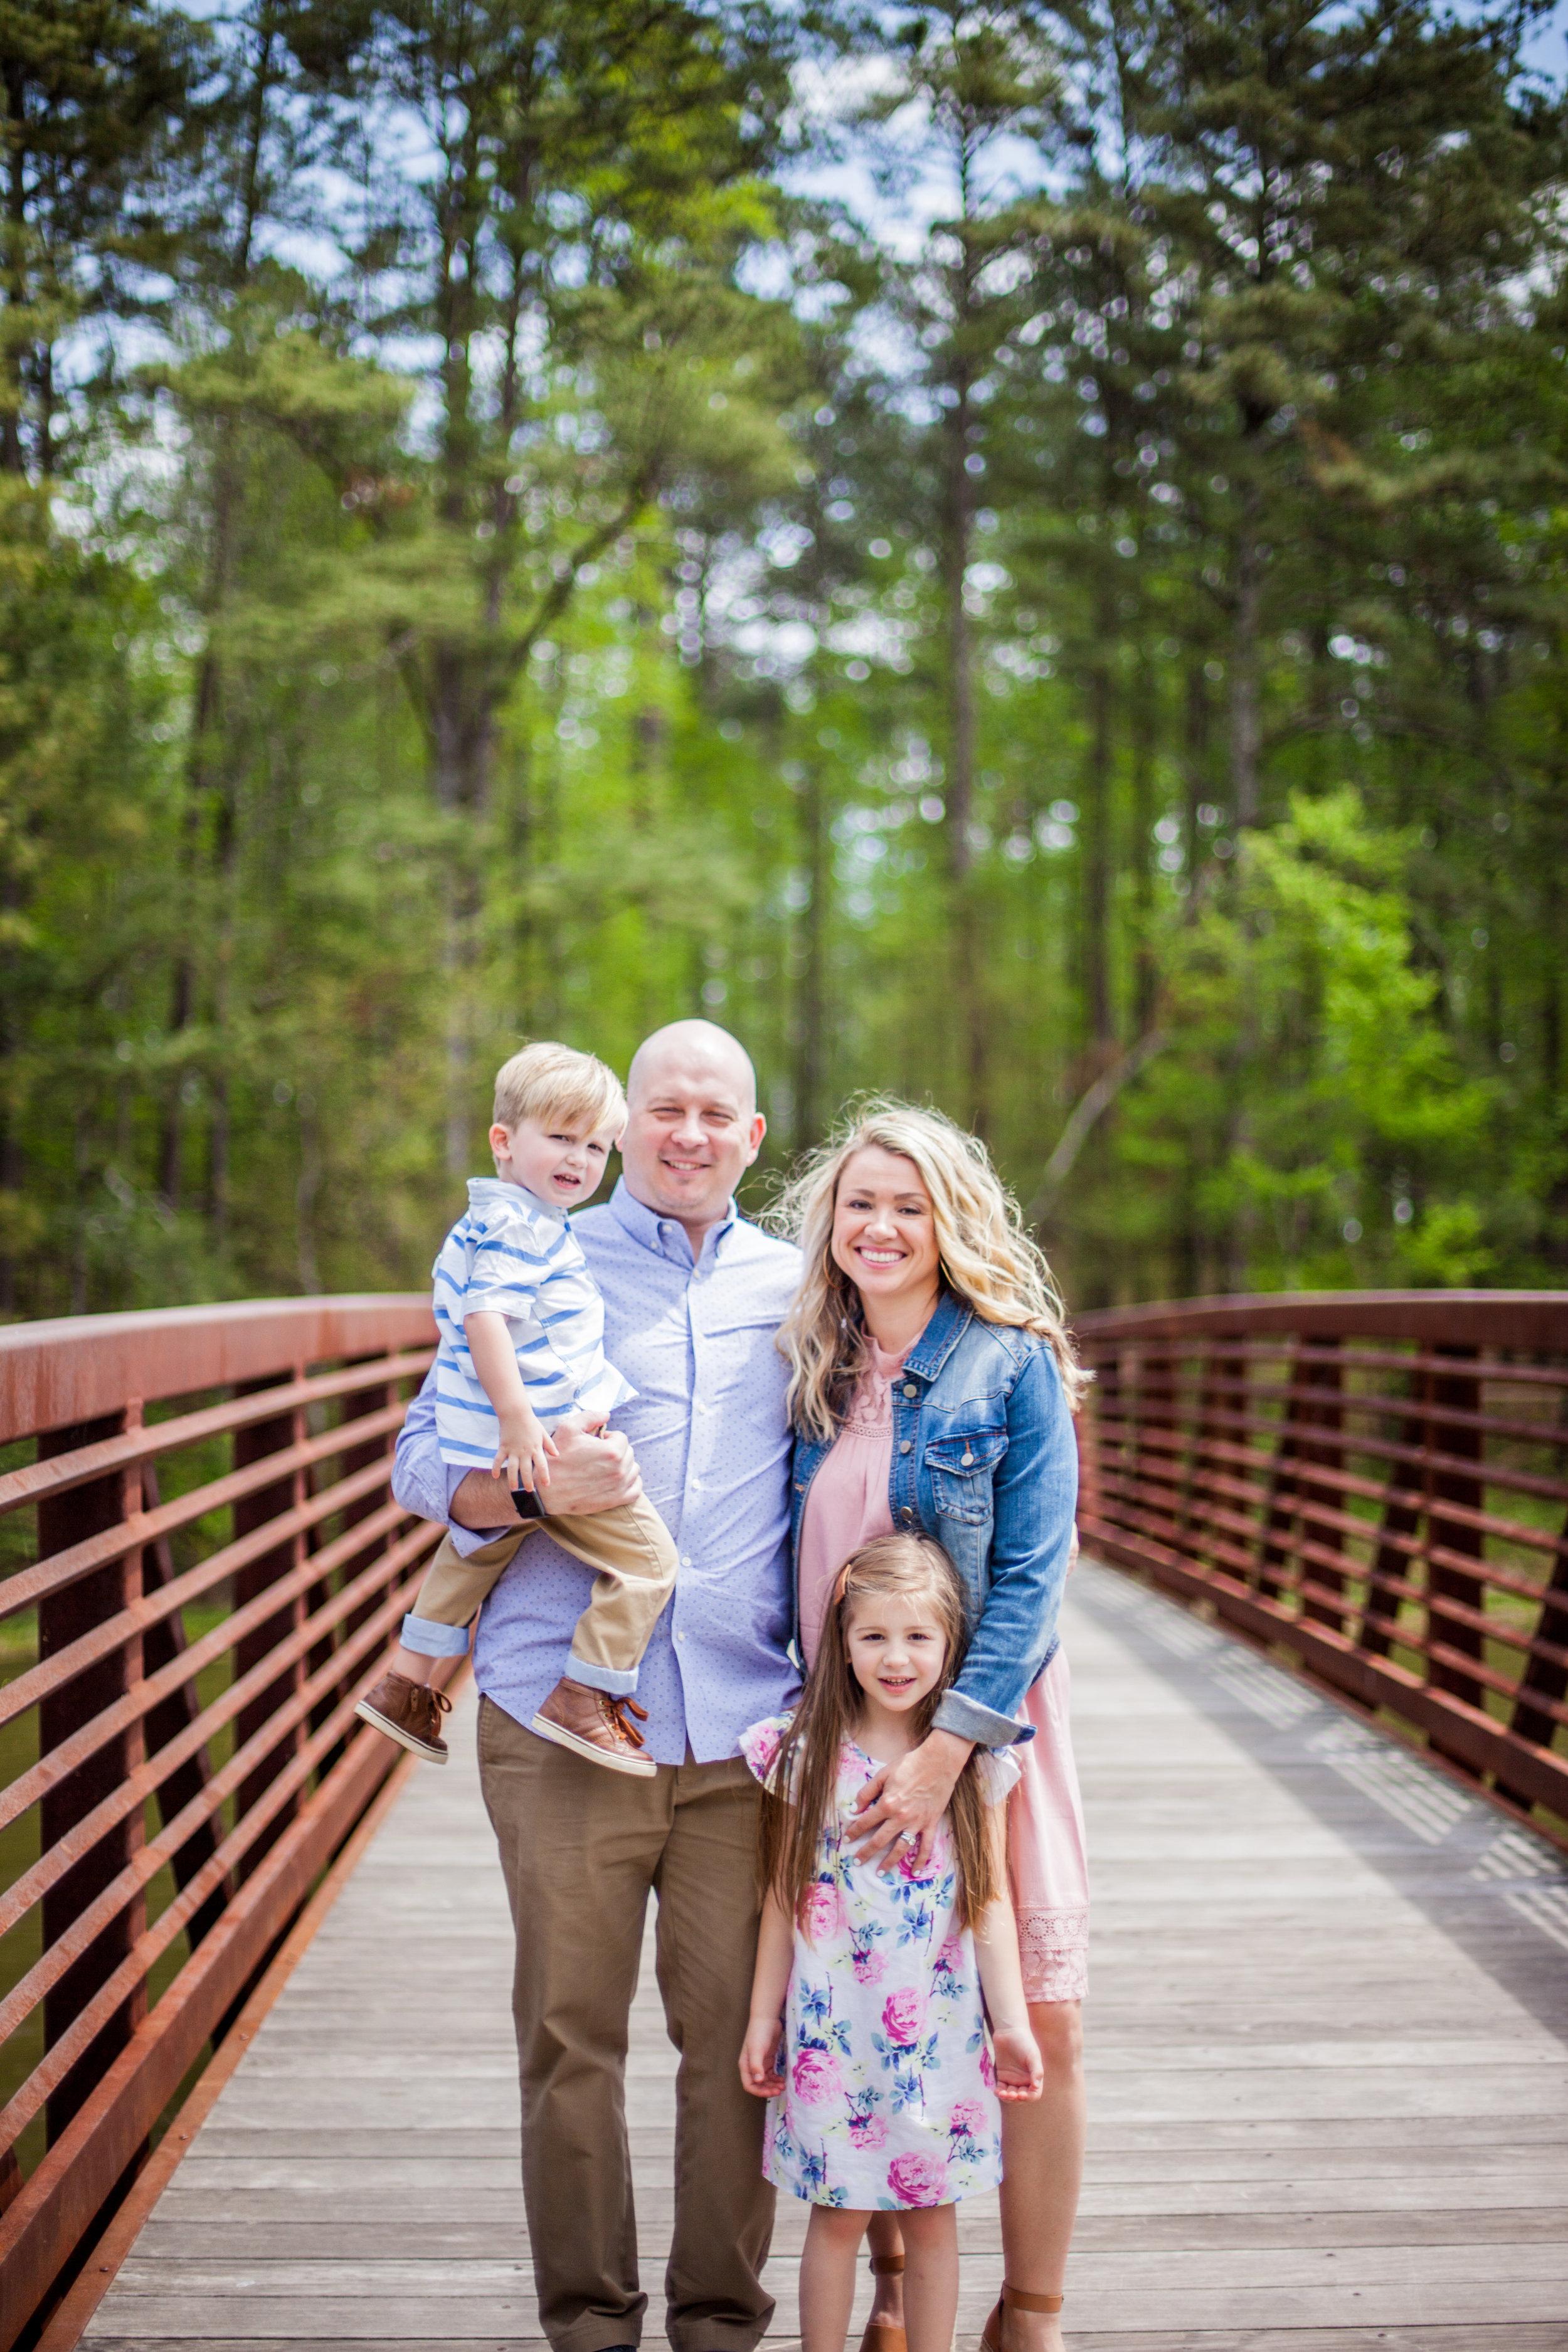 woodstock-family-photography-mini-session-acworth-beach-75.jpg